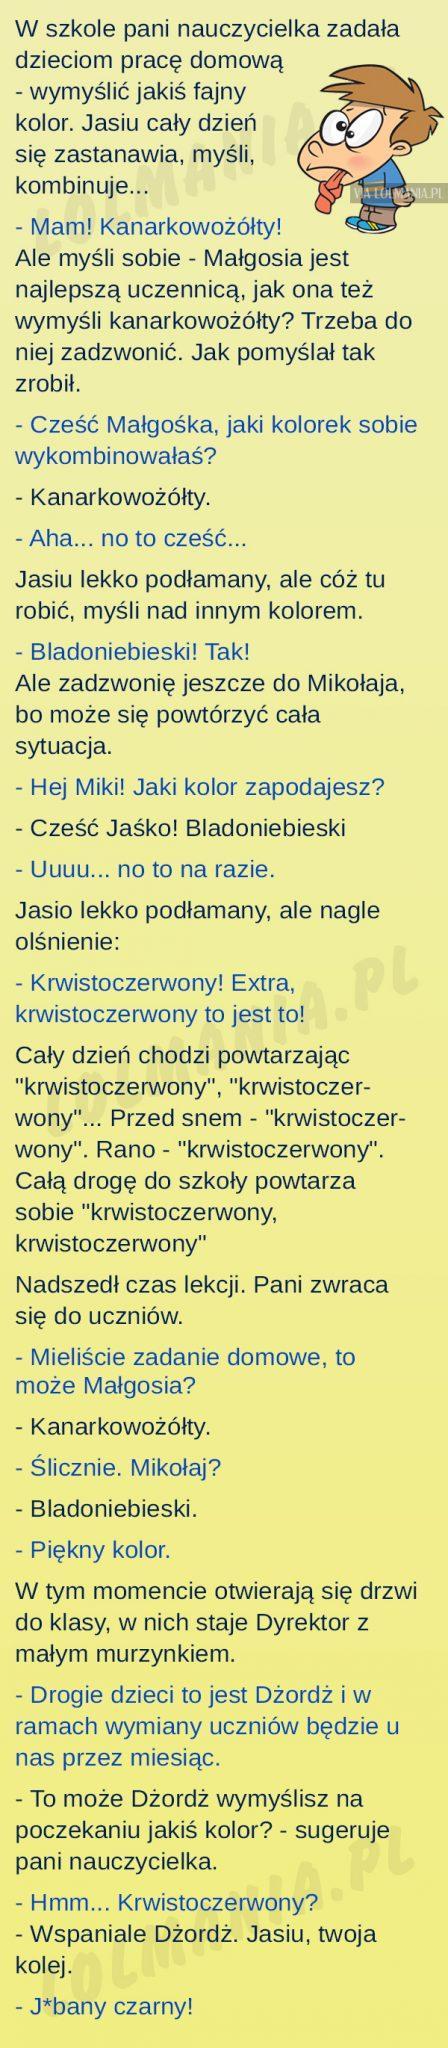 Rozterki Jasia :)